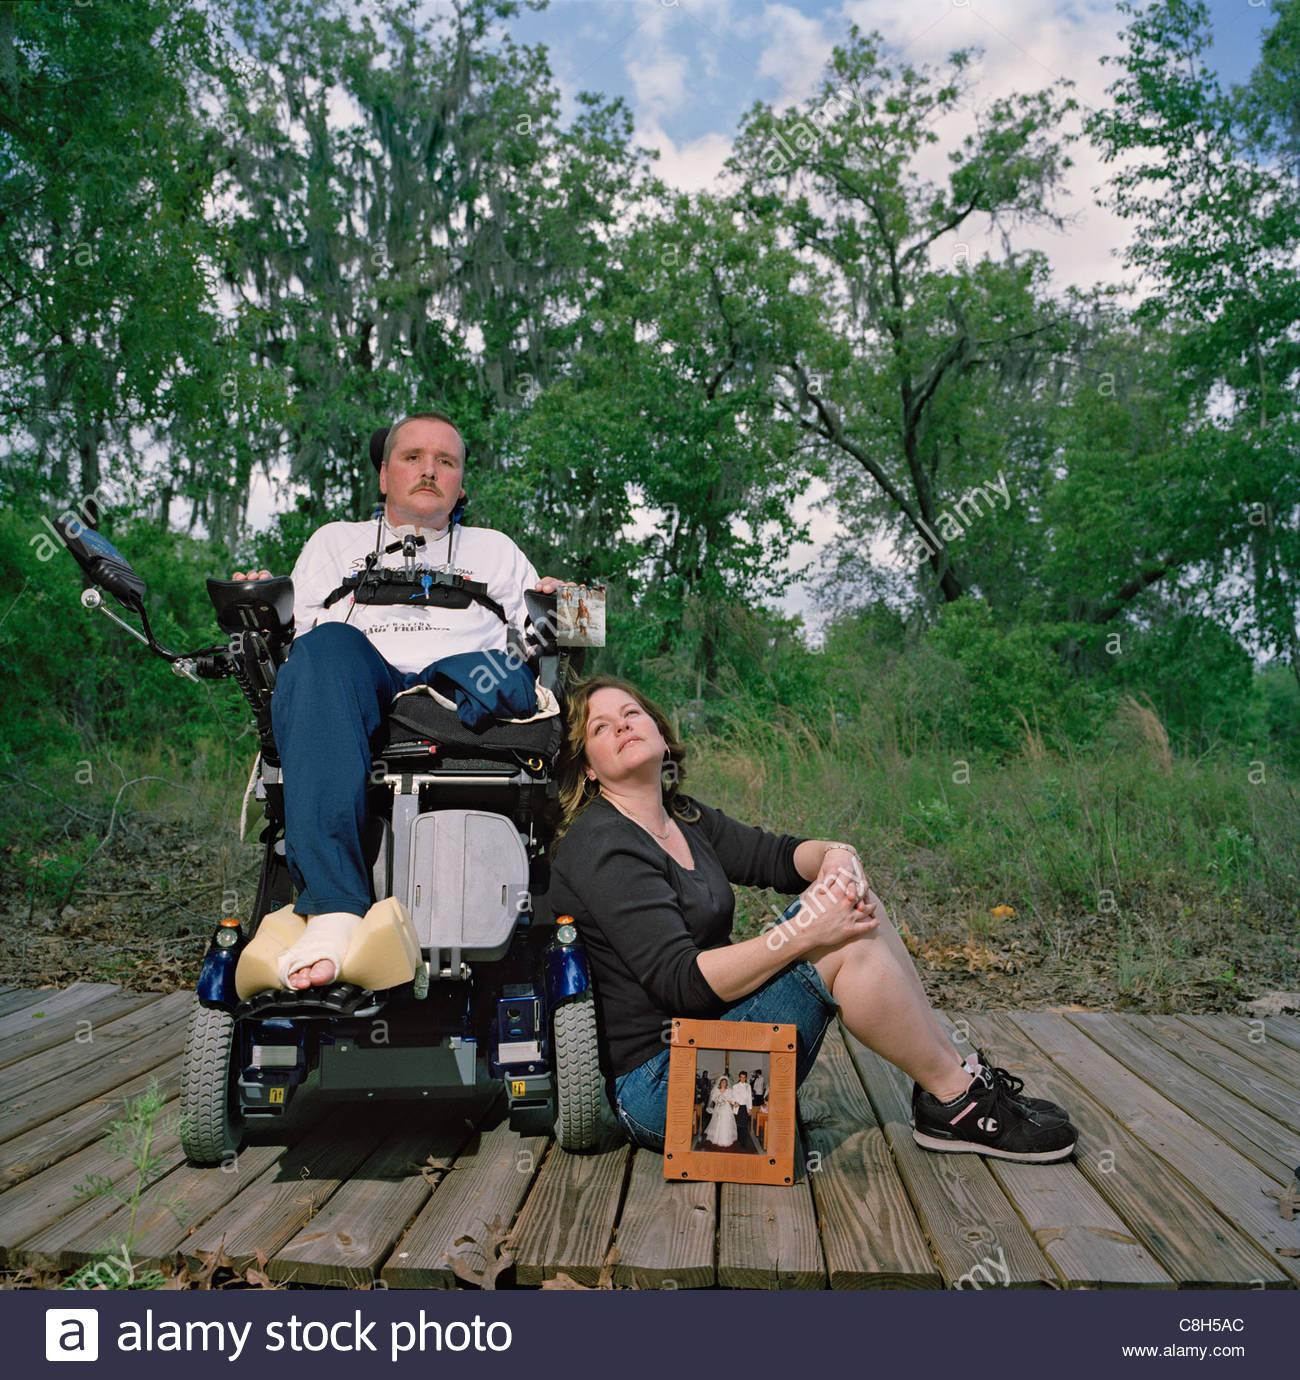 An Iraq war veteran experiences sensations from his amputated limb. - Stock Image